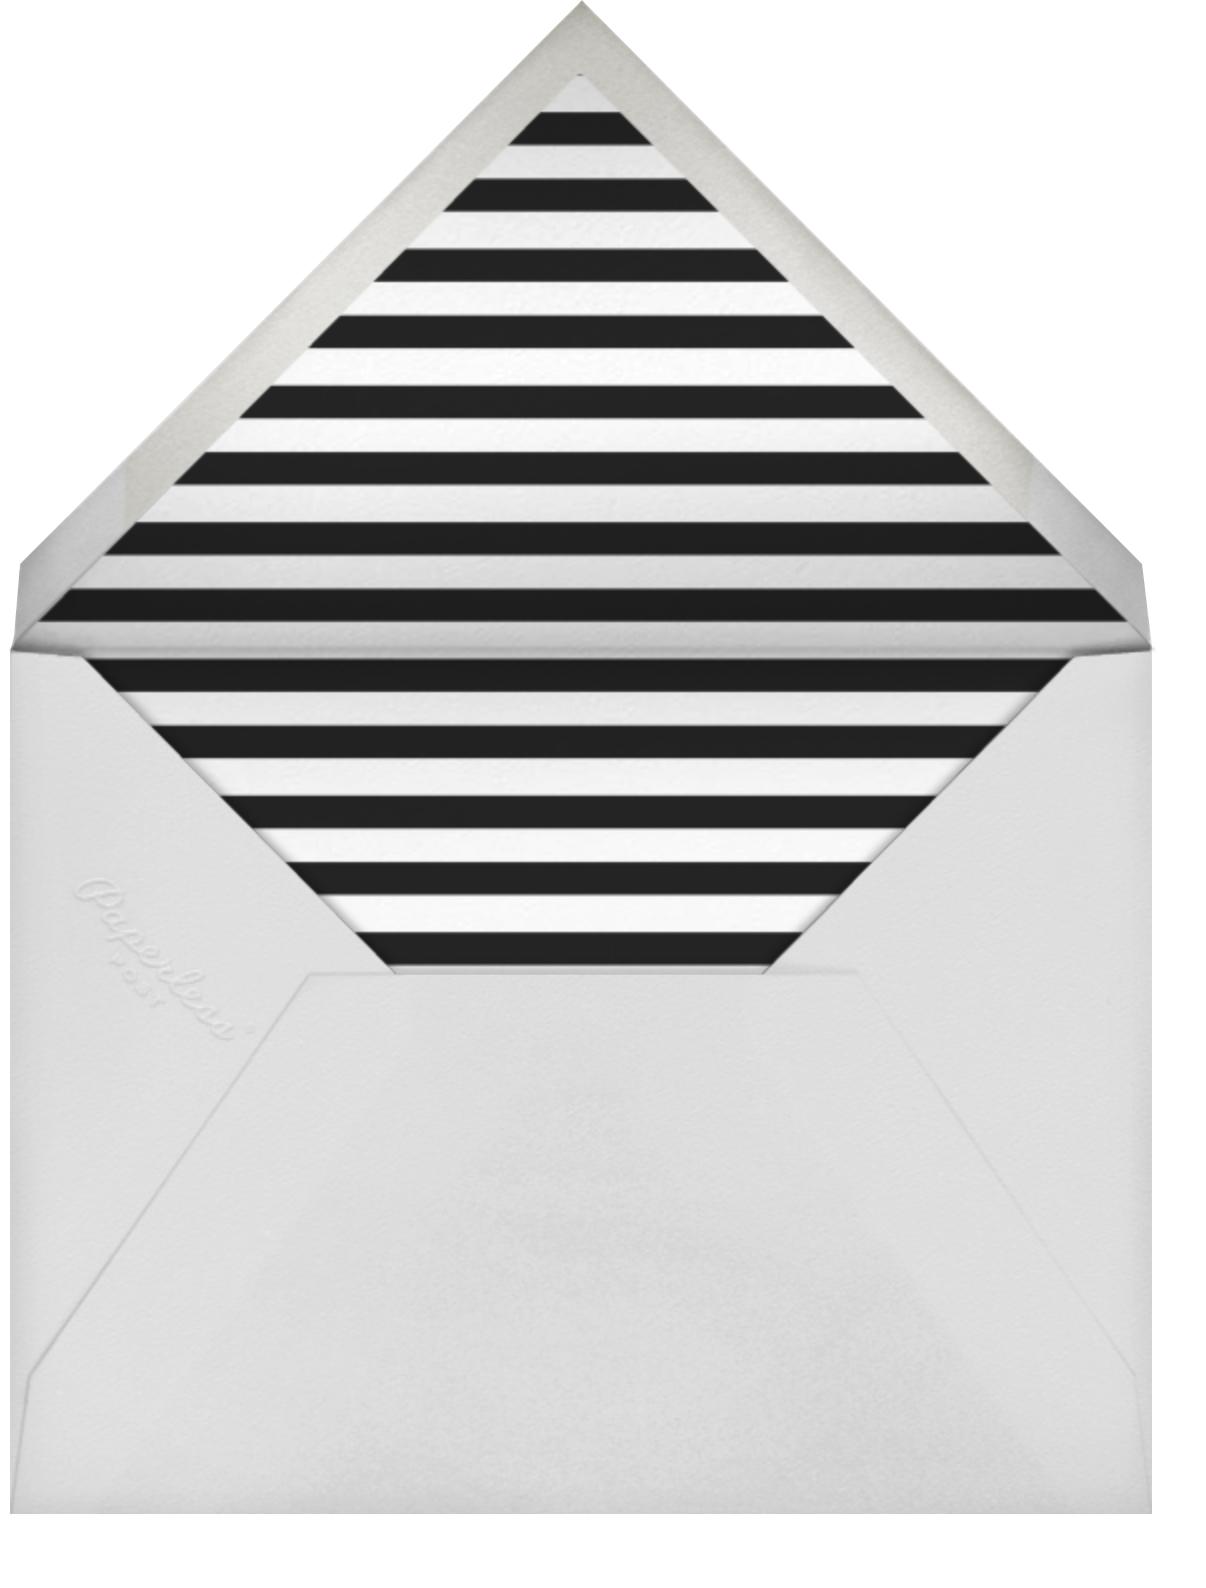 Quint - Black/Gold - Paperless Post - Graduation party - envelope back